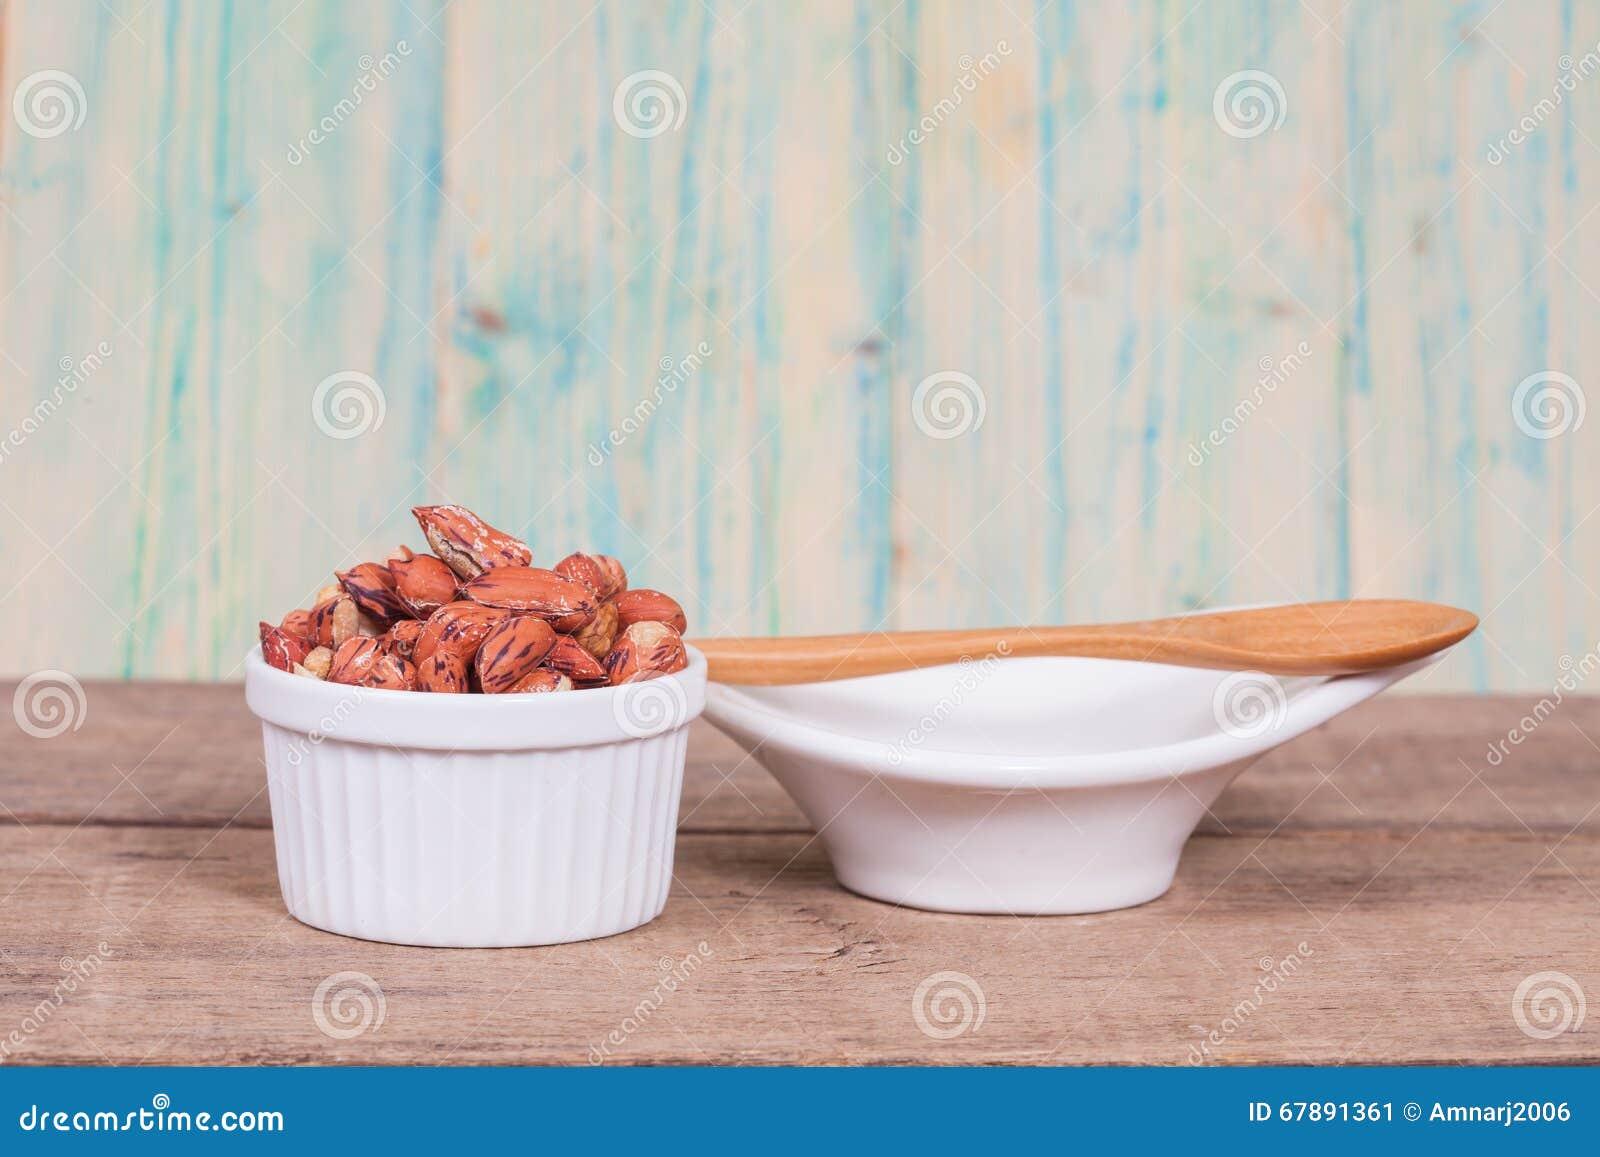 Tiger peanut in bowl on wood